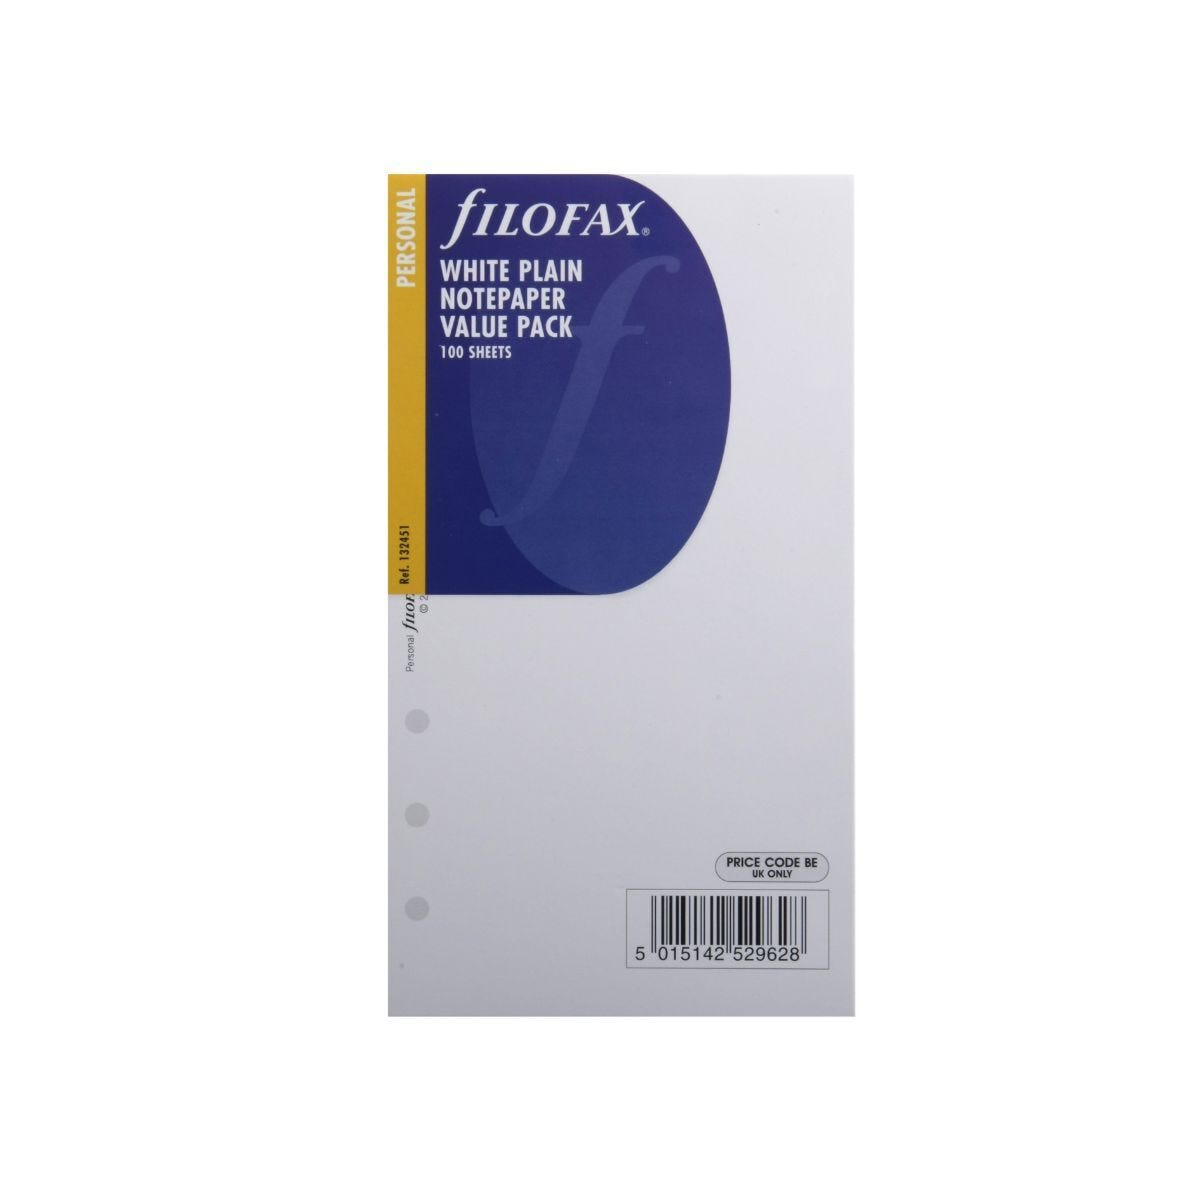 Filofax Refill Personal 100 Sheets Plain